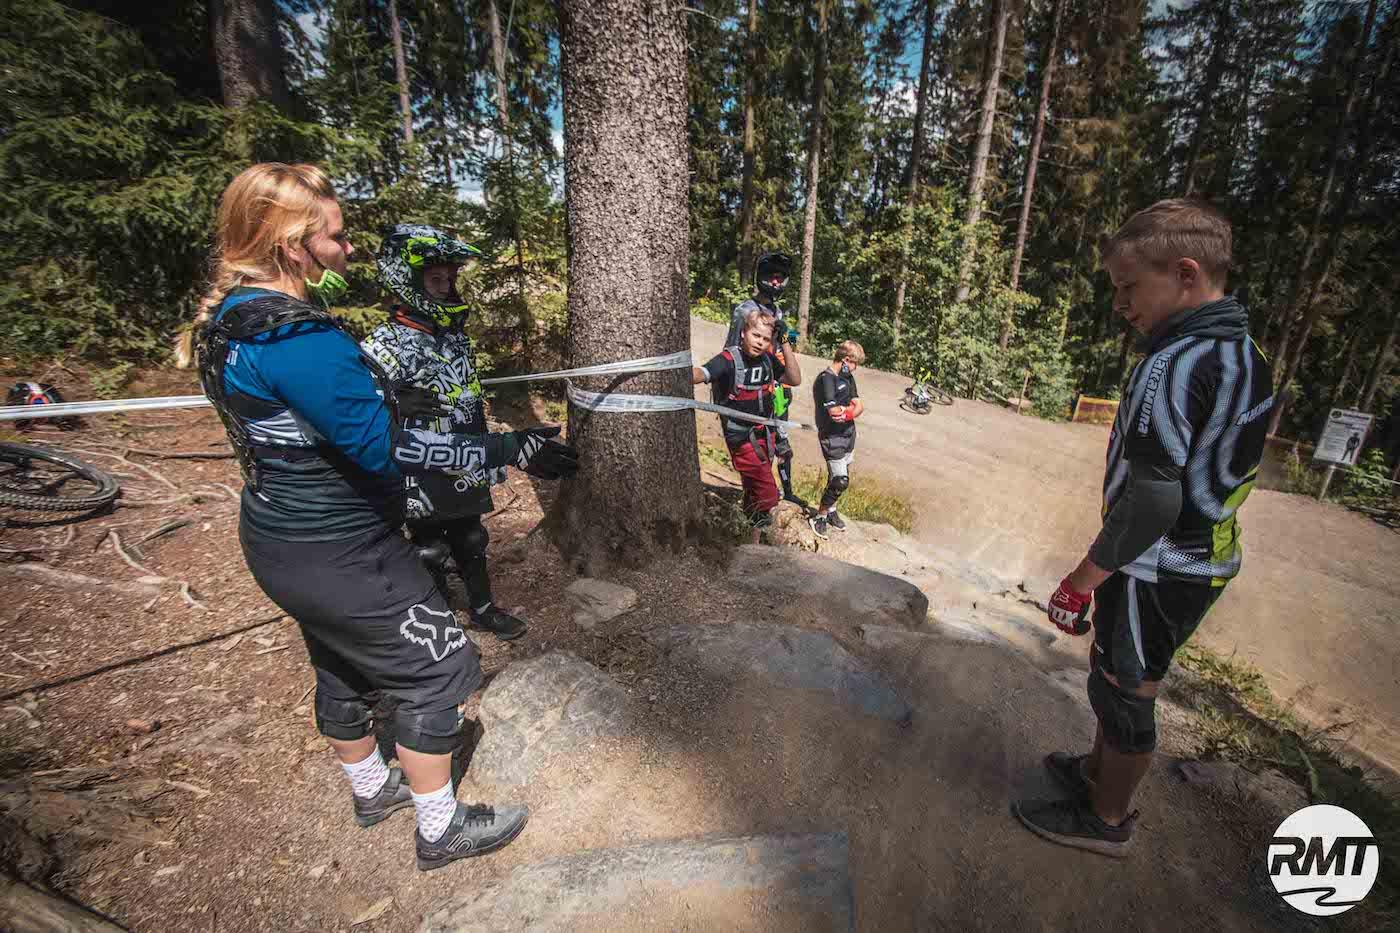 Bikepark Winterberg Kinder Kurs Fahrtechnik Basic Training 8-12 Jahre - Rock my Trail Bikeschule 6